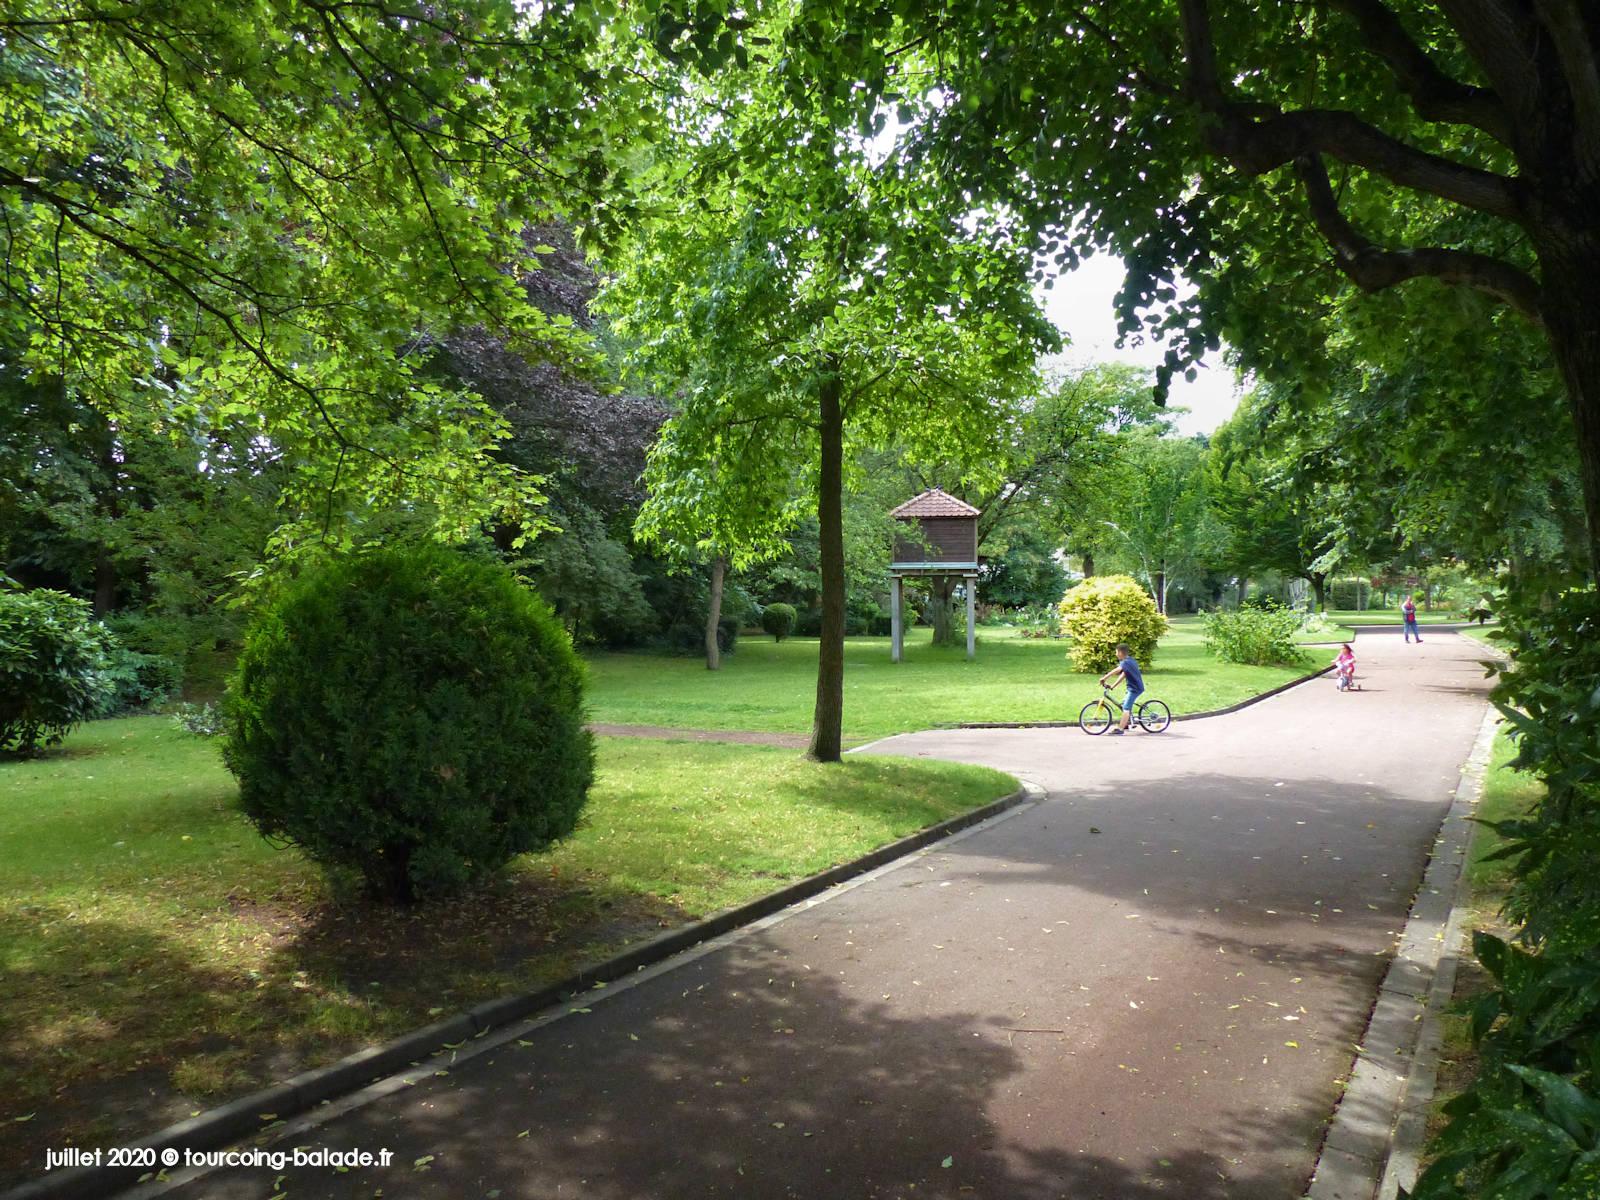 Square Alexis Parsy, Tourcoing, 2020